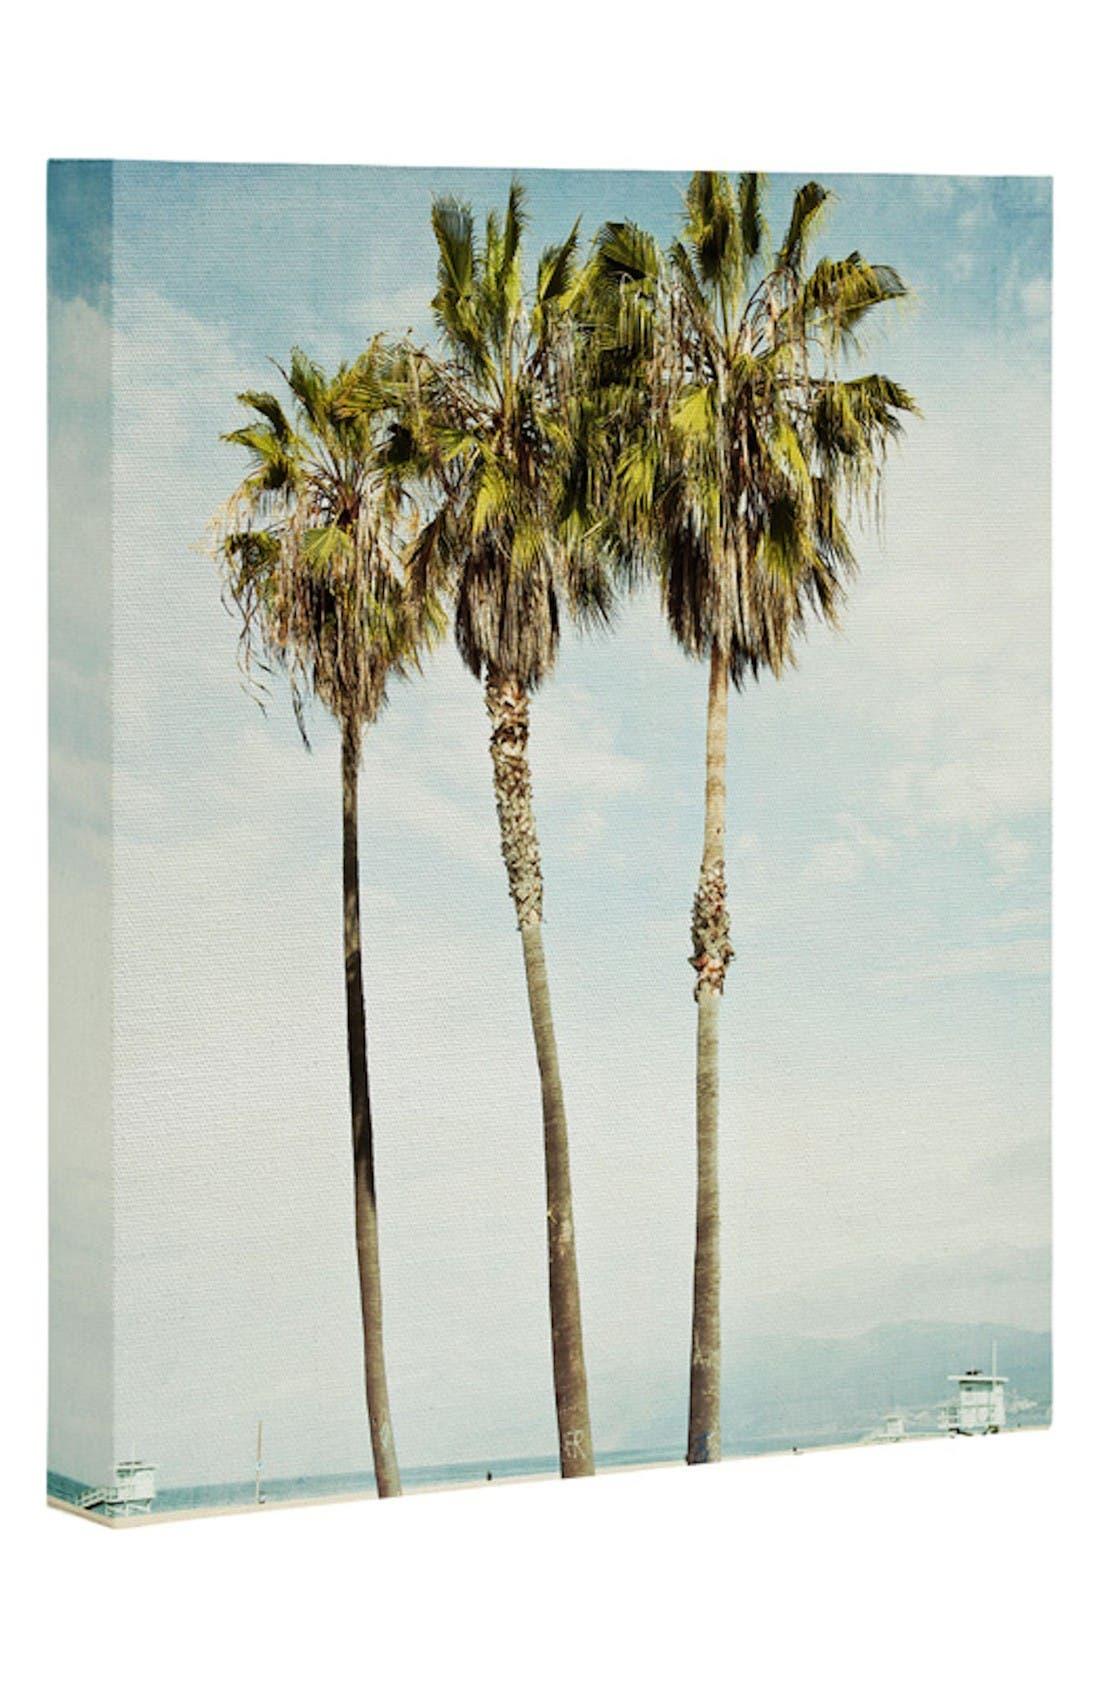 Alternate Image 1 Selected - Deny Designs Venice Beach Palms Wall Art